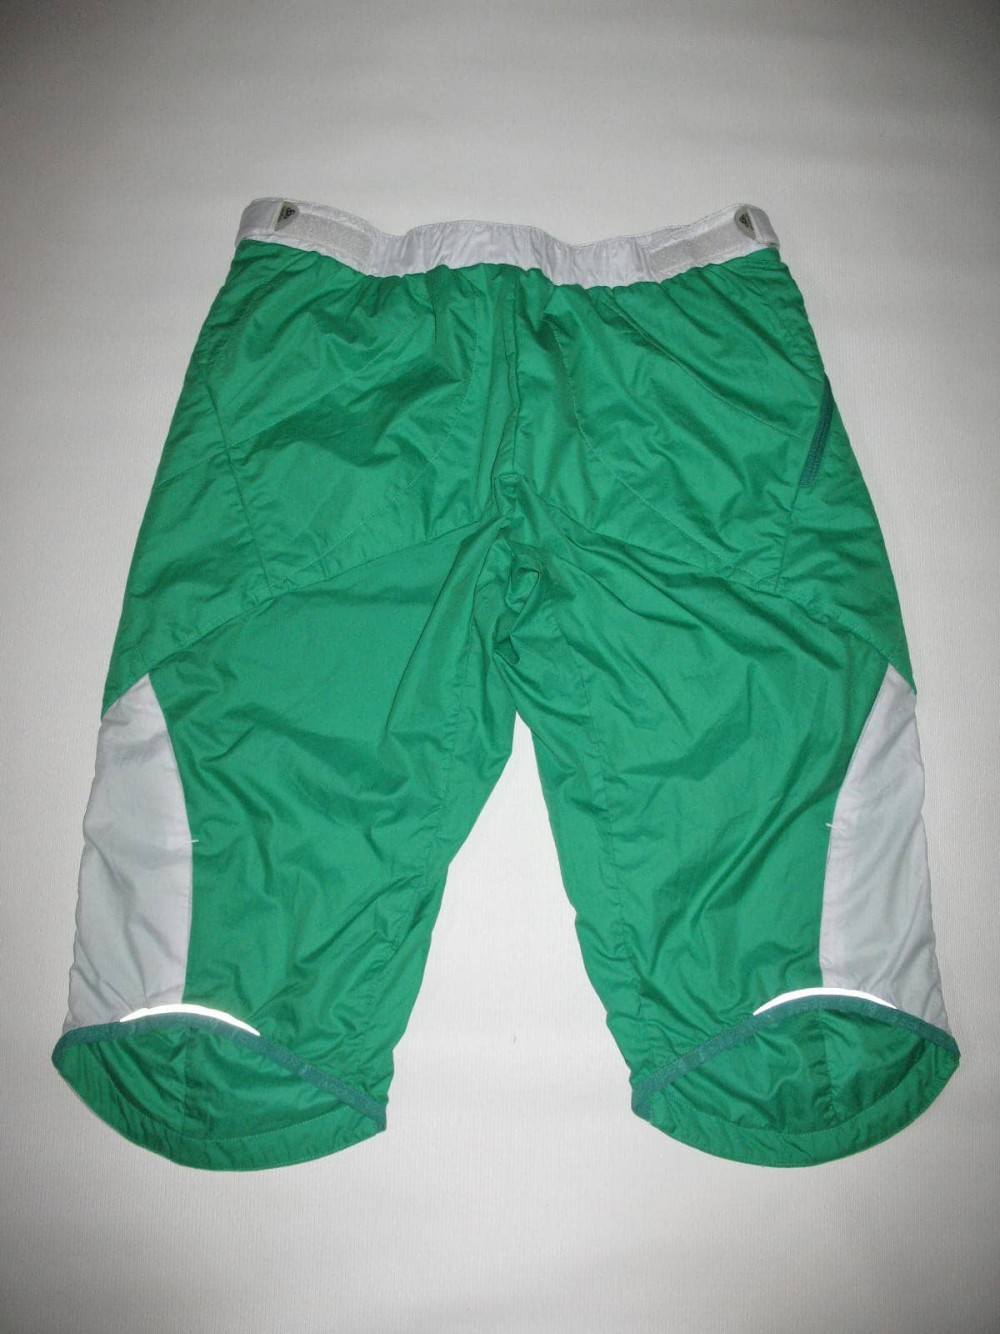 Шорты ODLO primaloft shorts lady (размер S/M) - 3